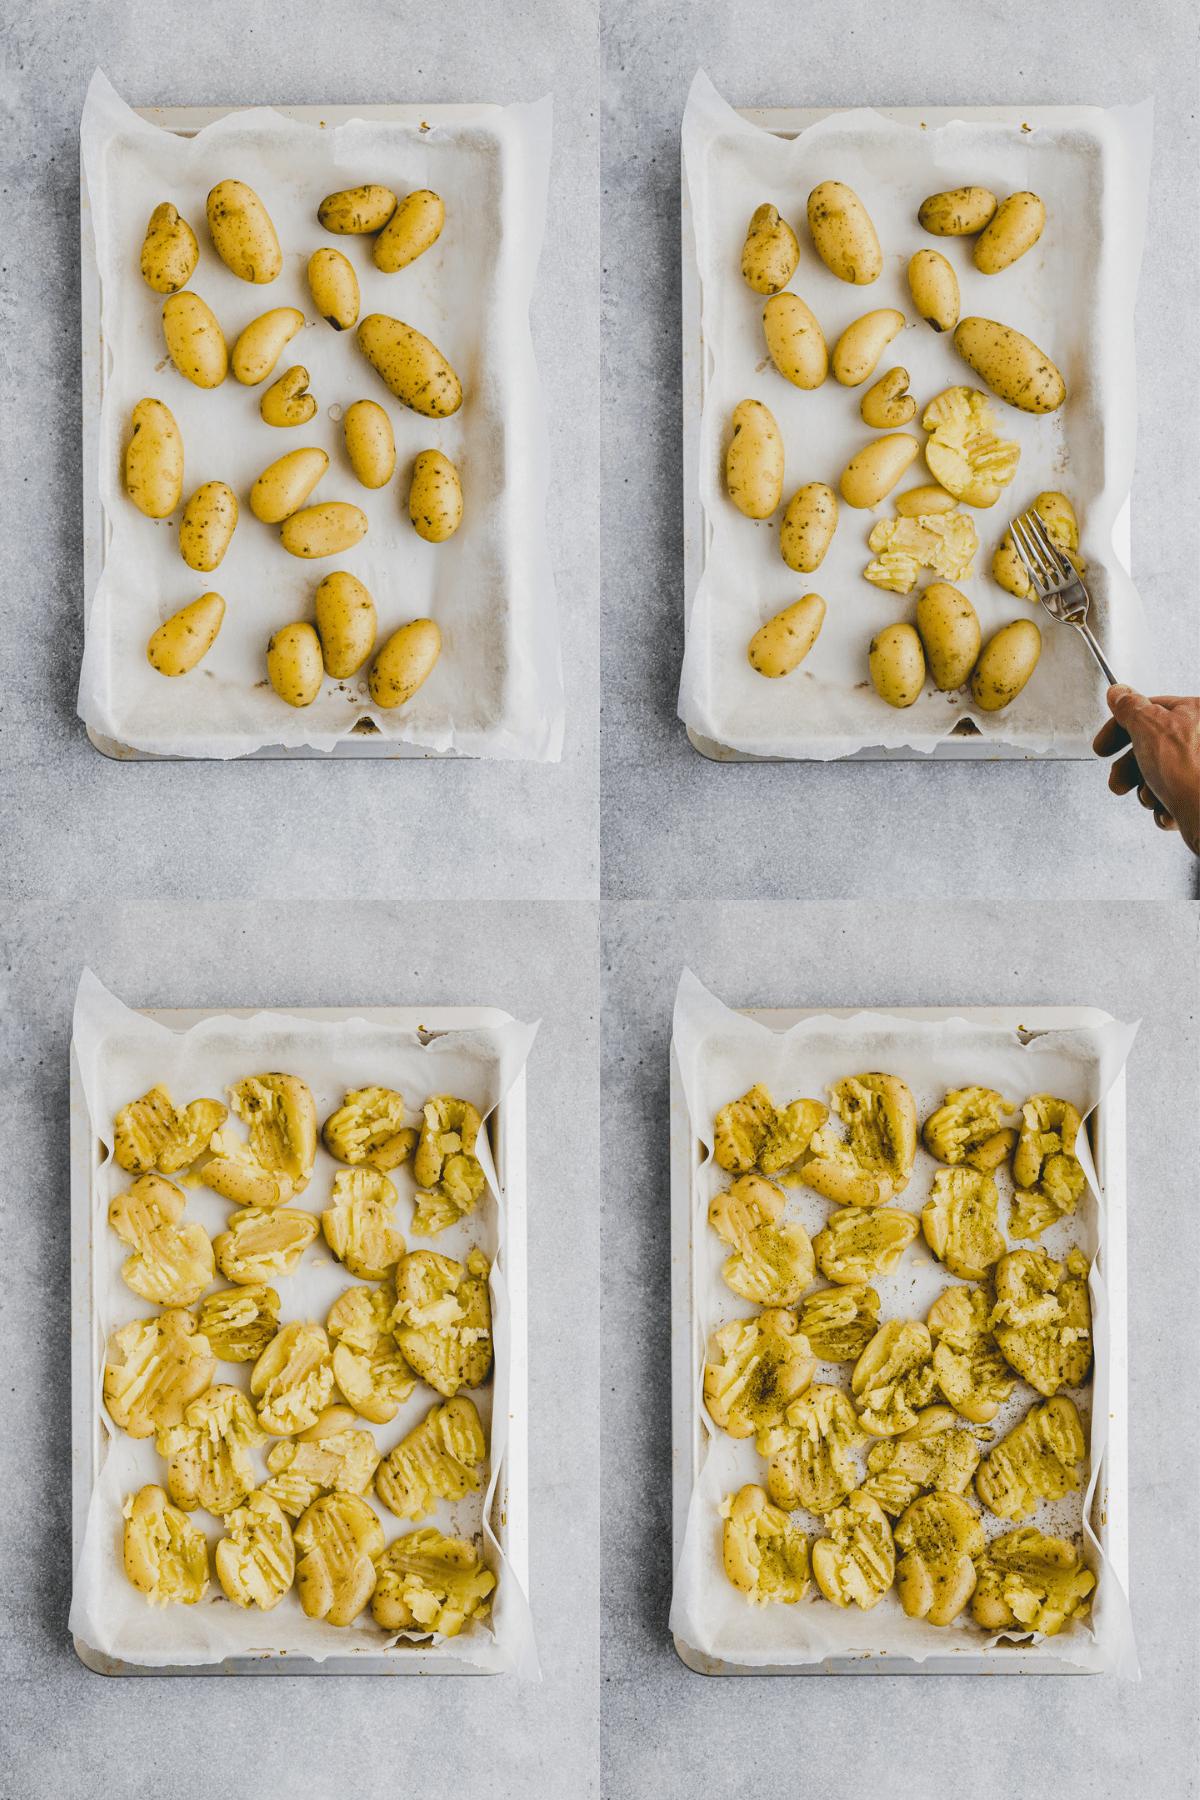 Smashed Potatoes Recipe Step 3-6